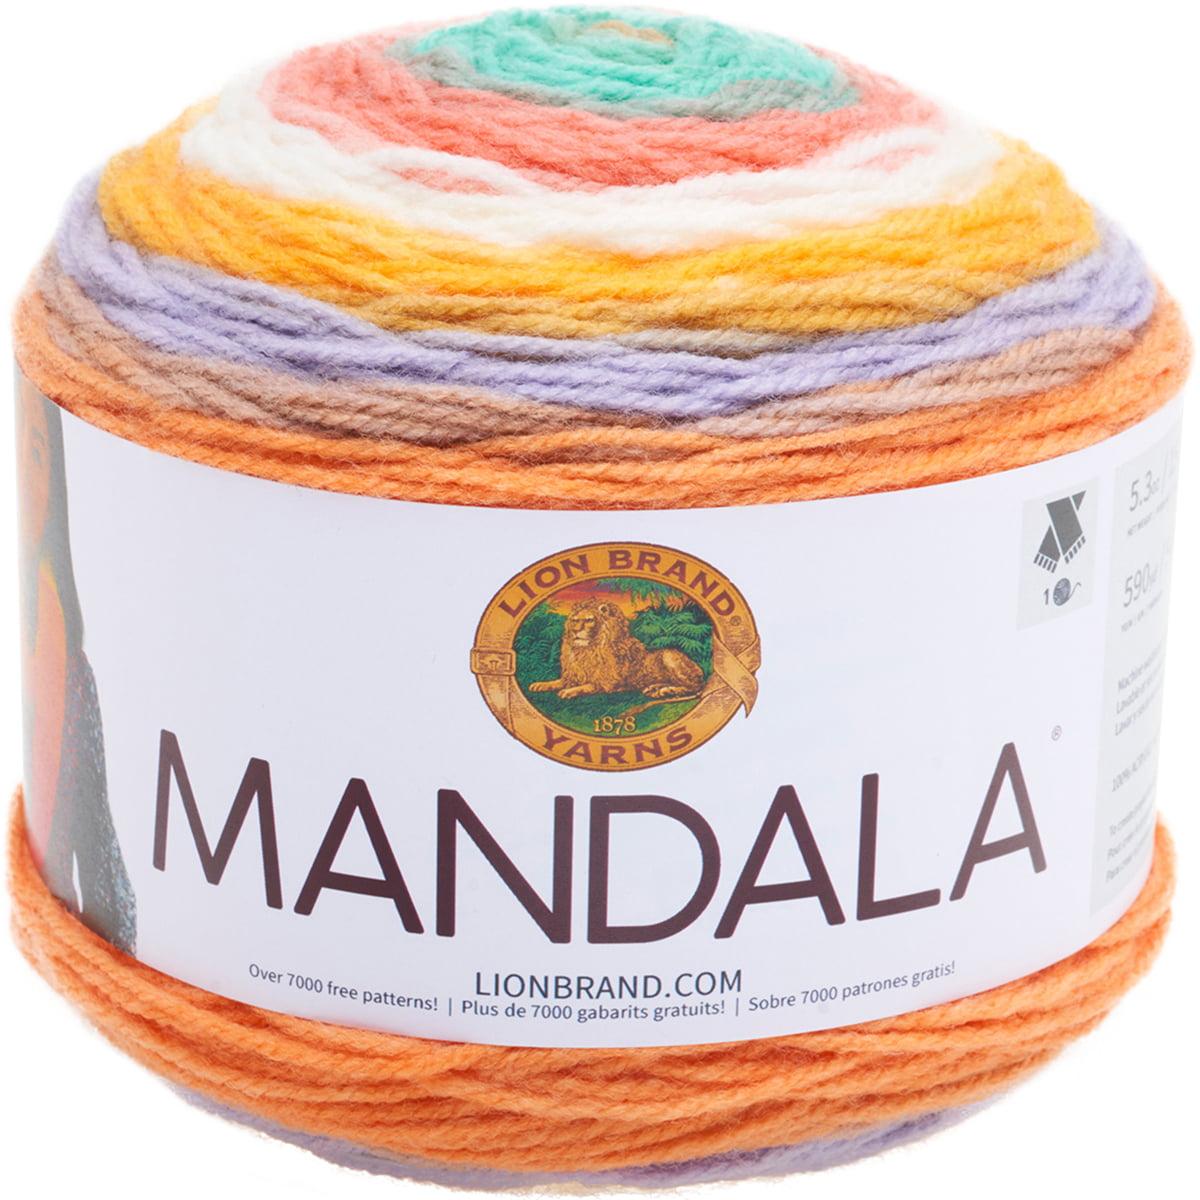 Lion Brand Yarn Madala Pixie Self-Striping Light Acrylic Multi-color Yarn